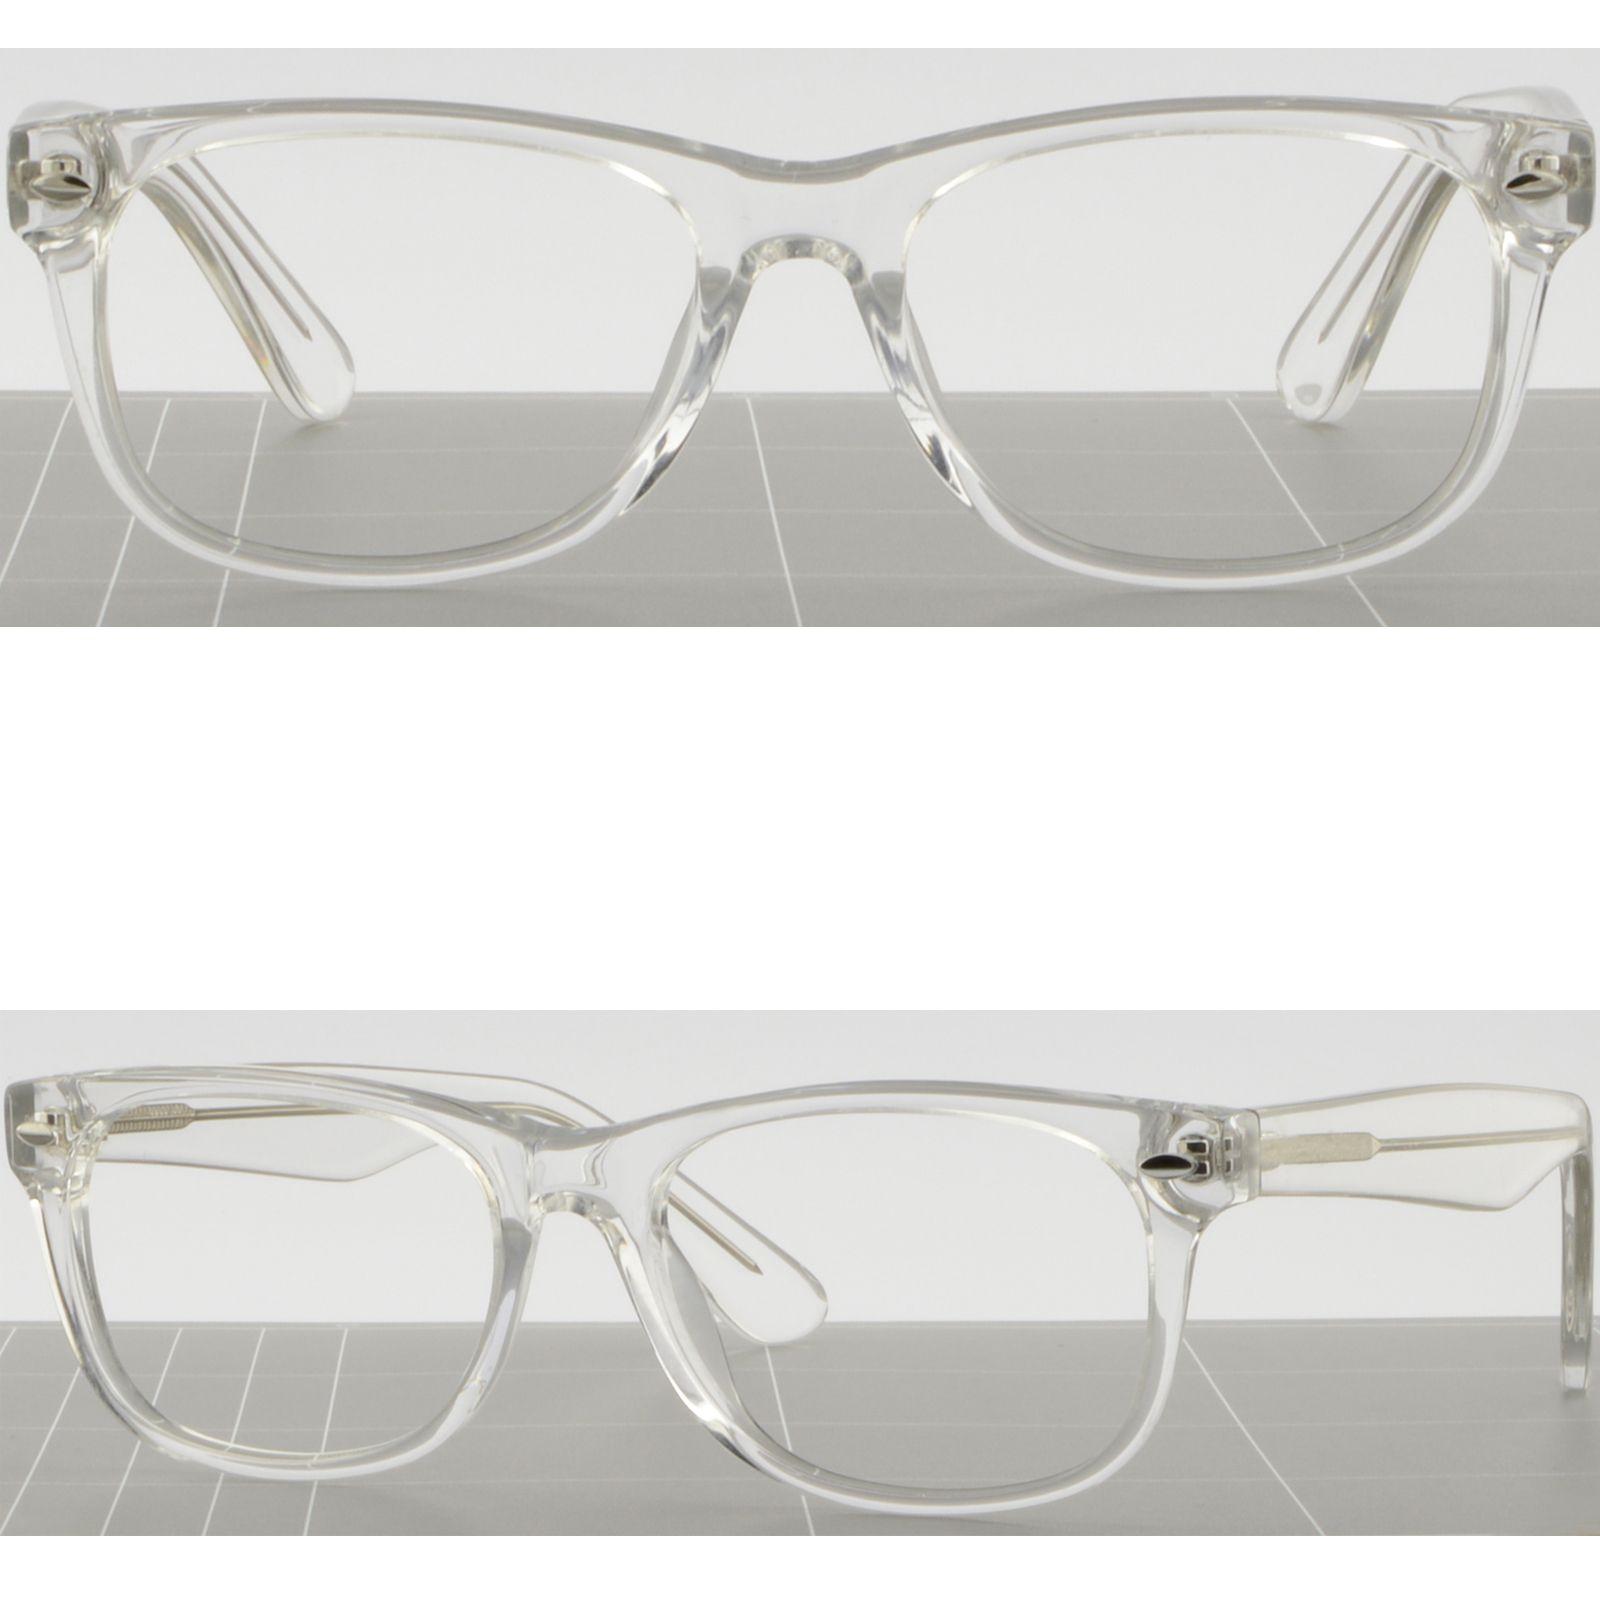 Thick Square Acetate Frames Light Clear Plastic Prescription Glasses ...